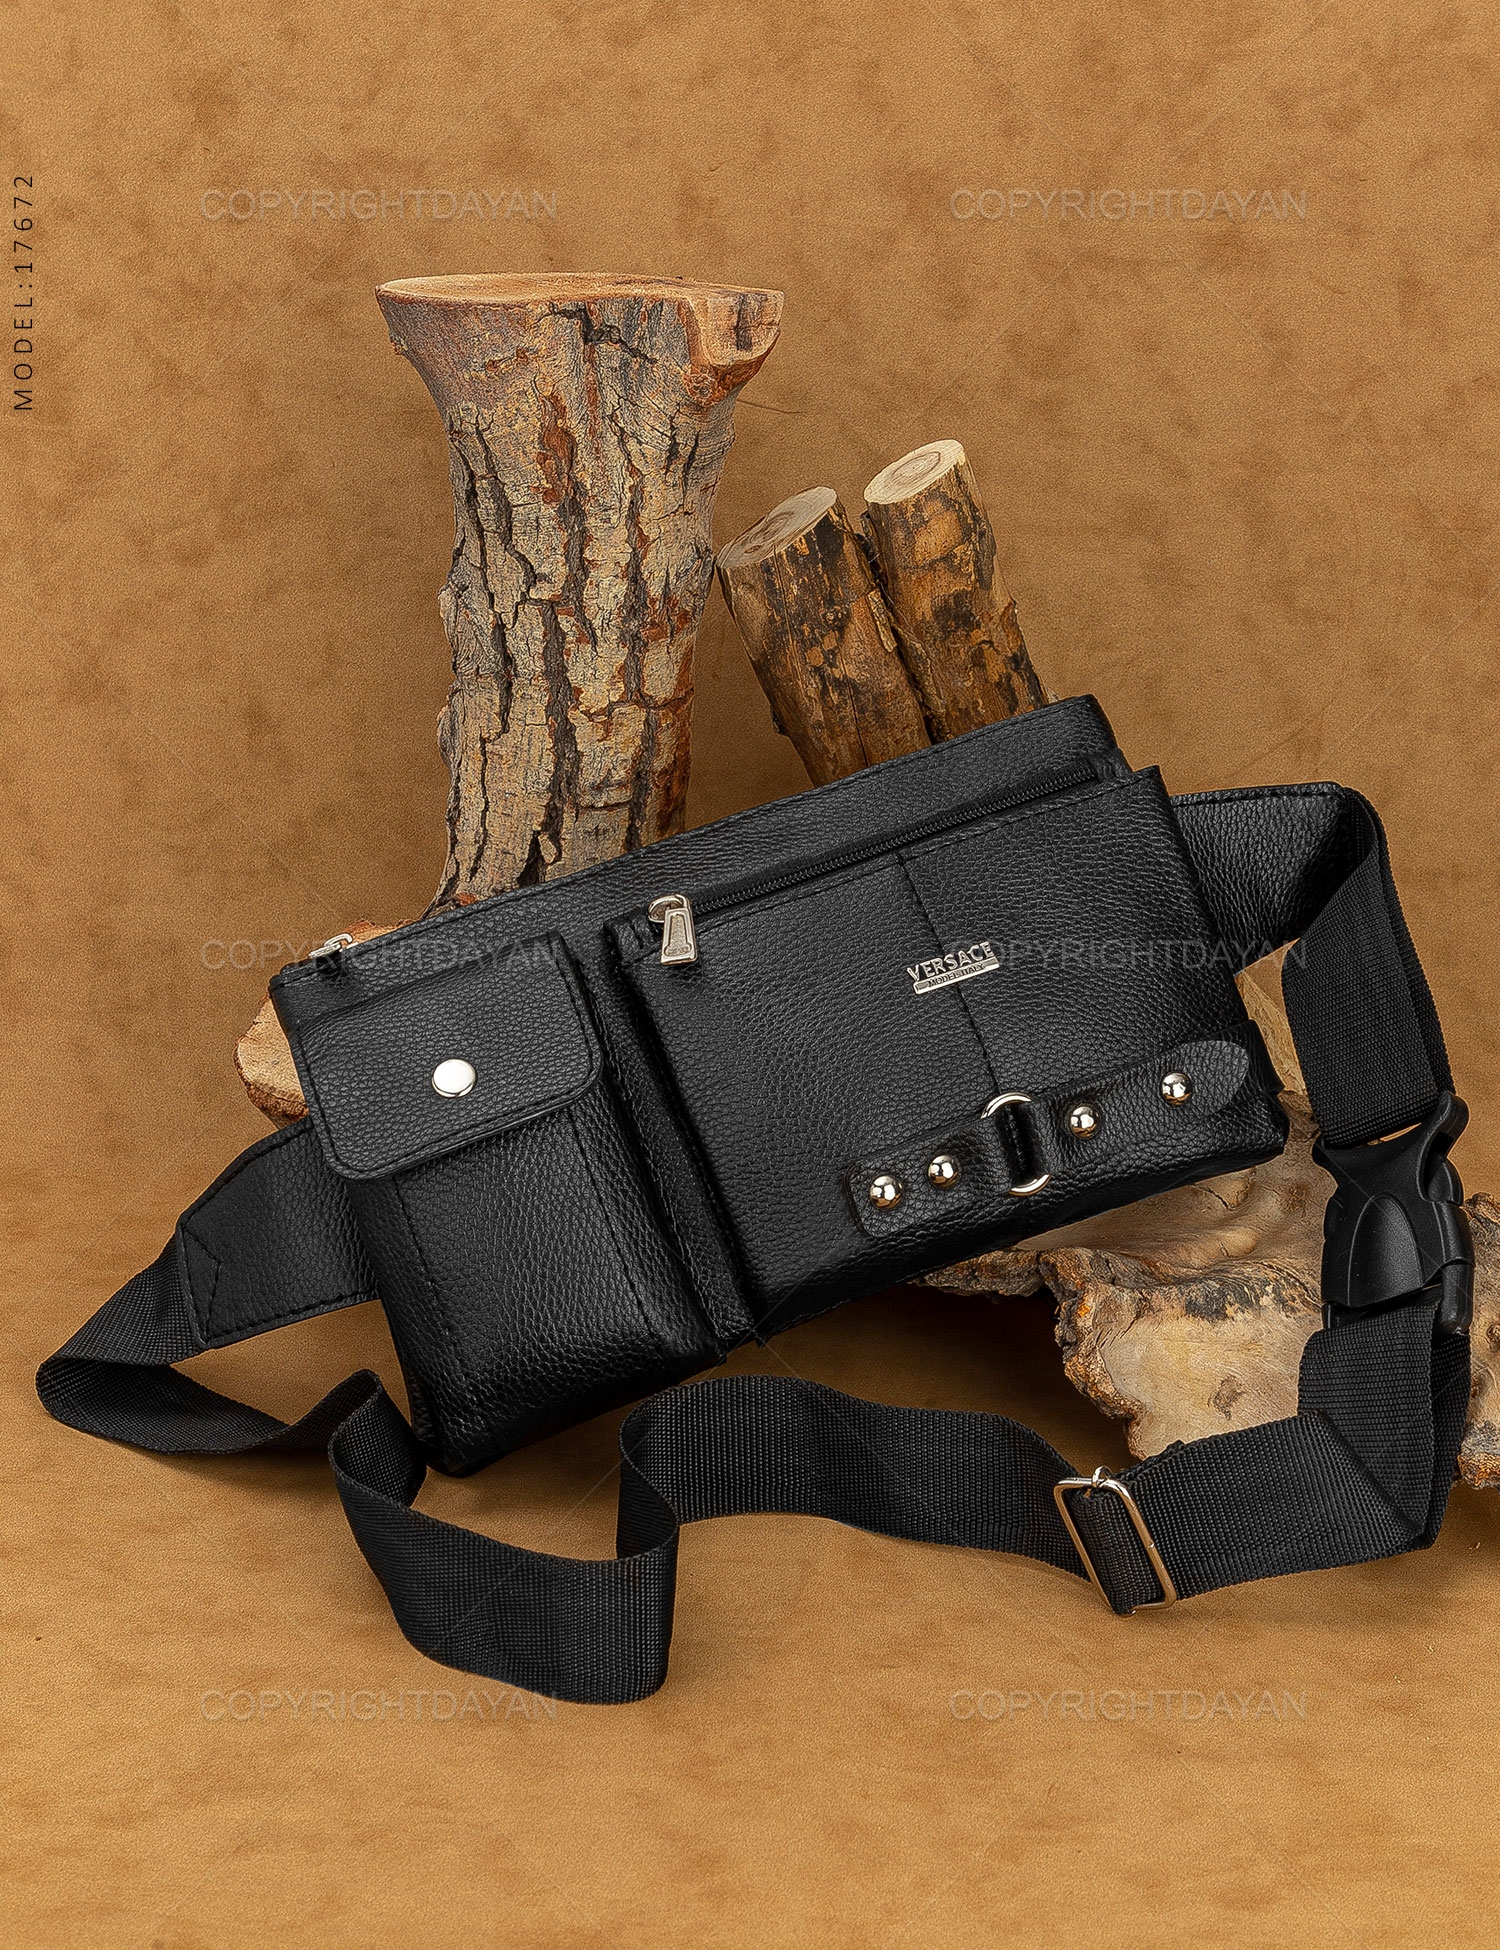 کیف کمری Versace مدل 17672